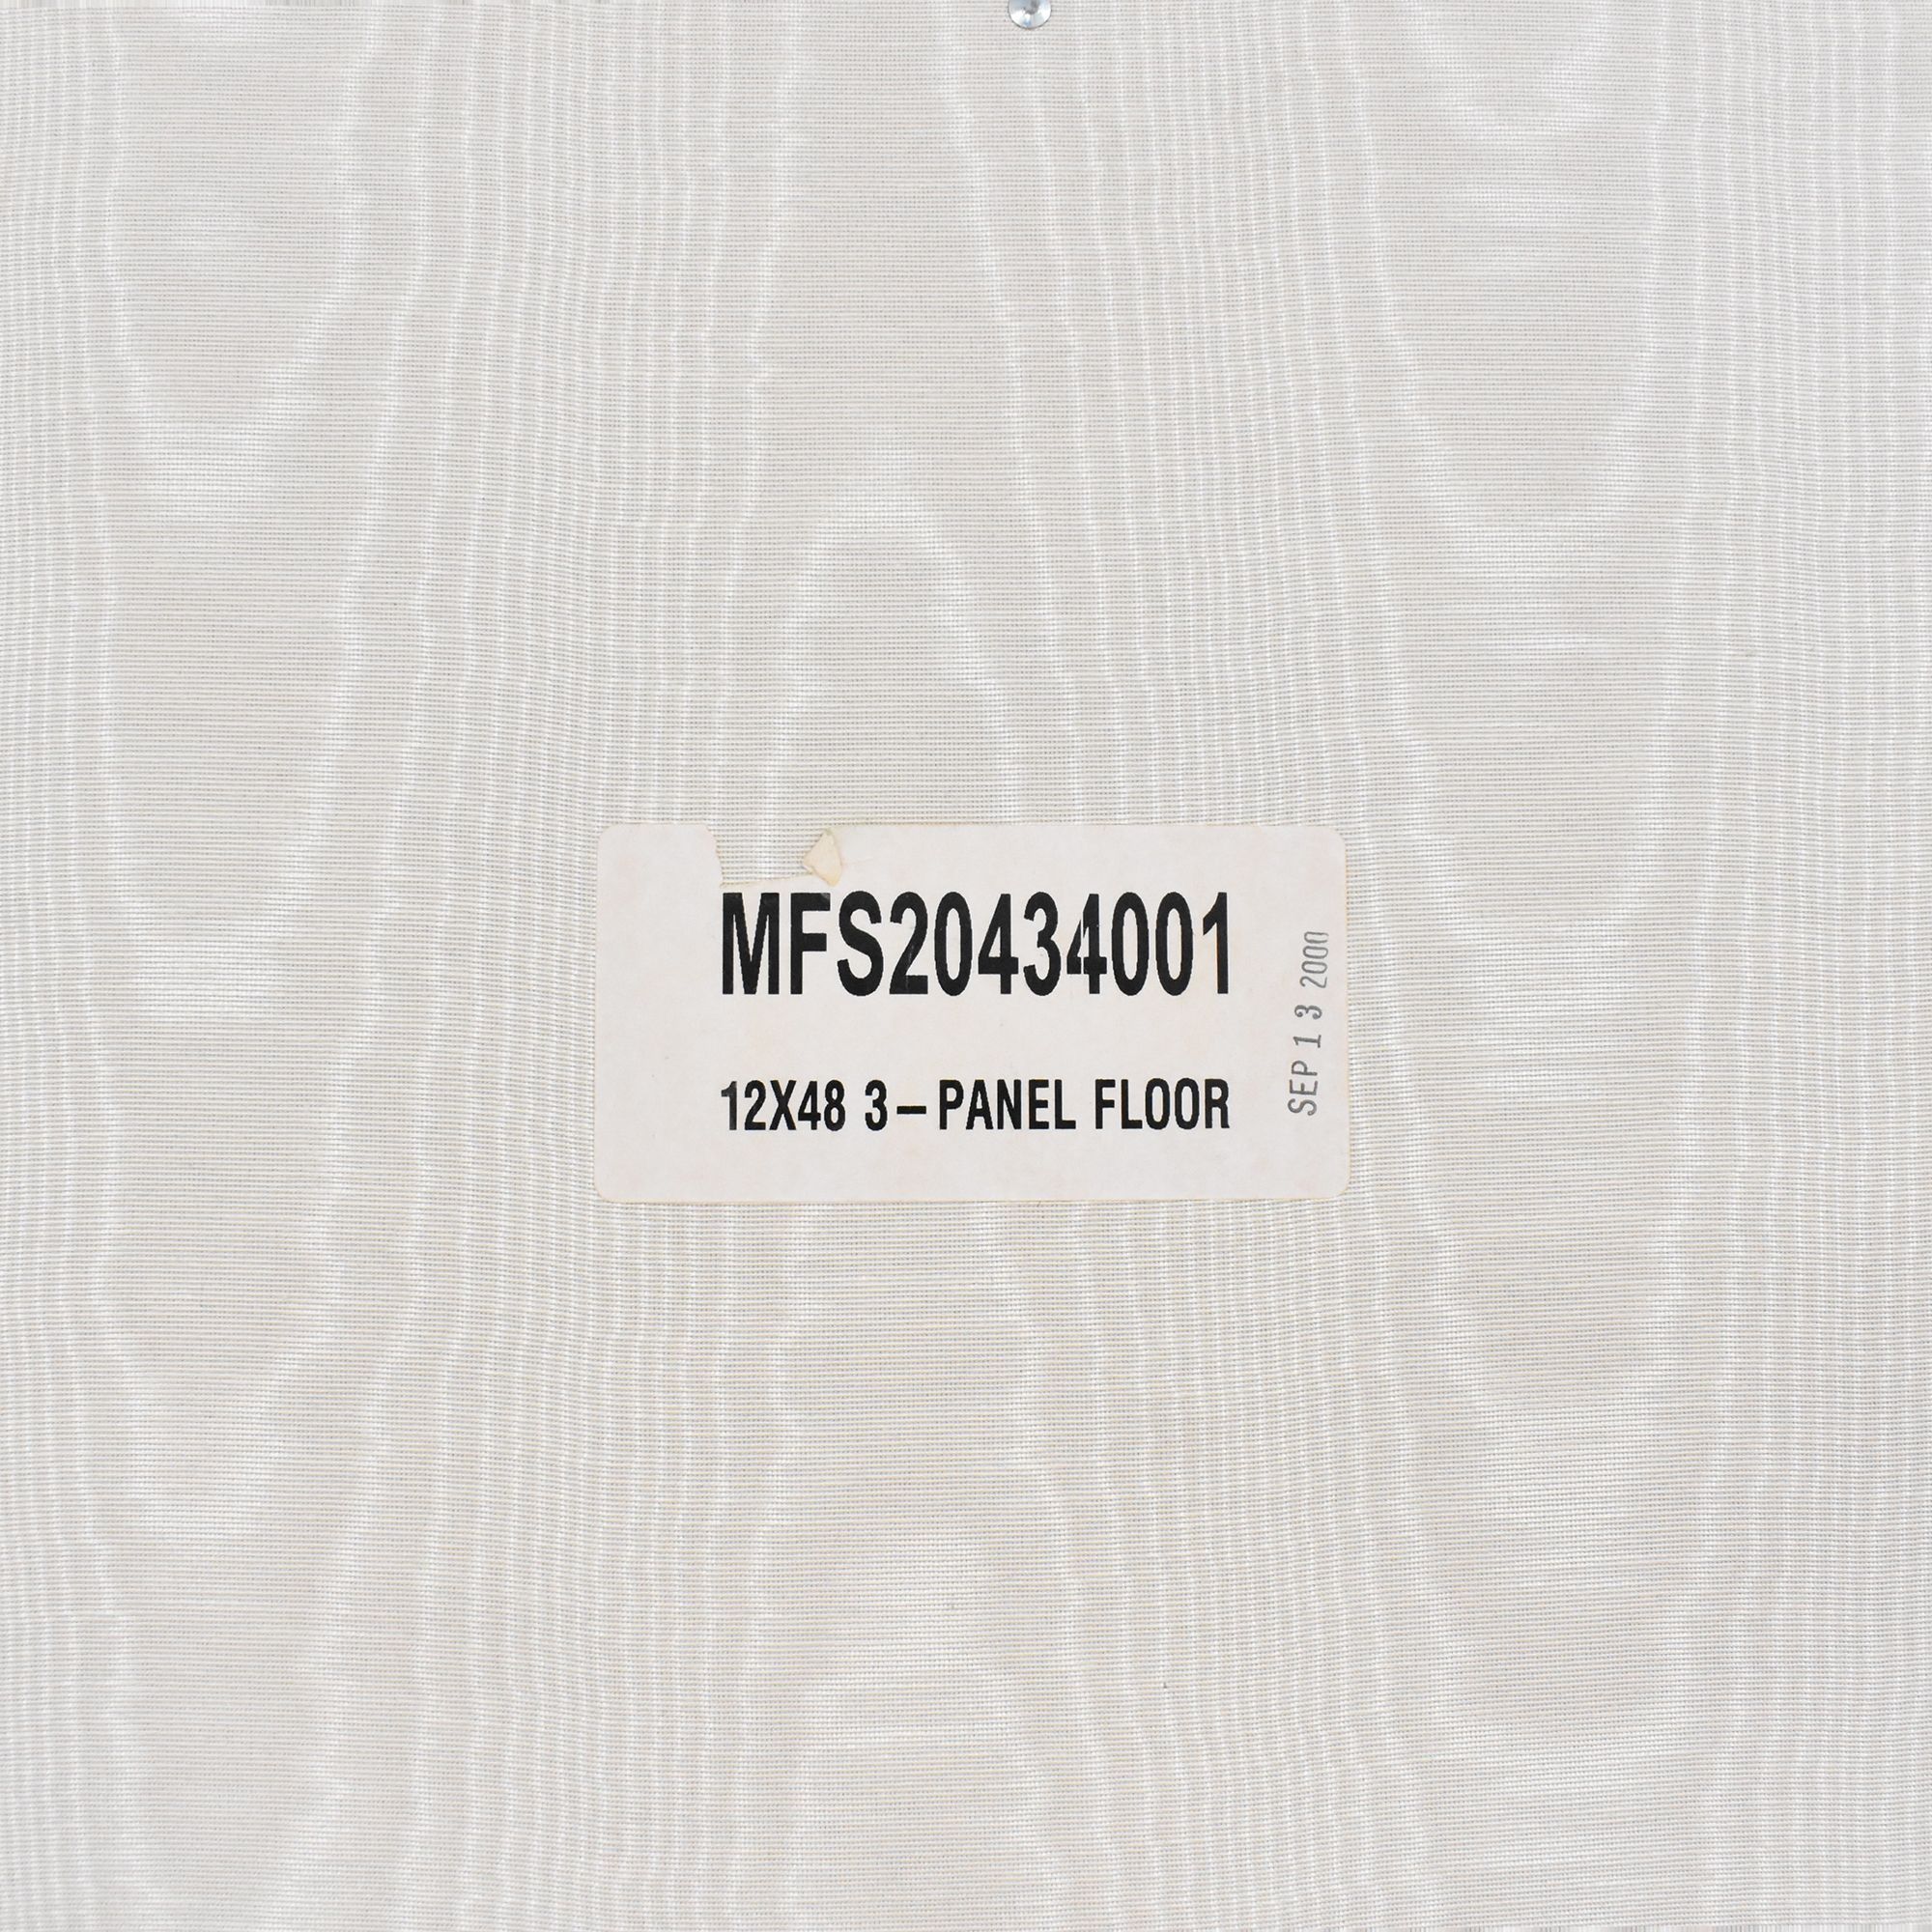 Tri-Panel Floor Mirror price